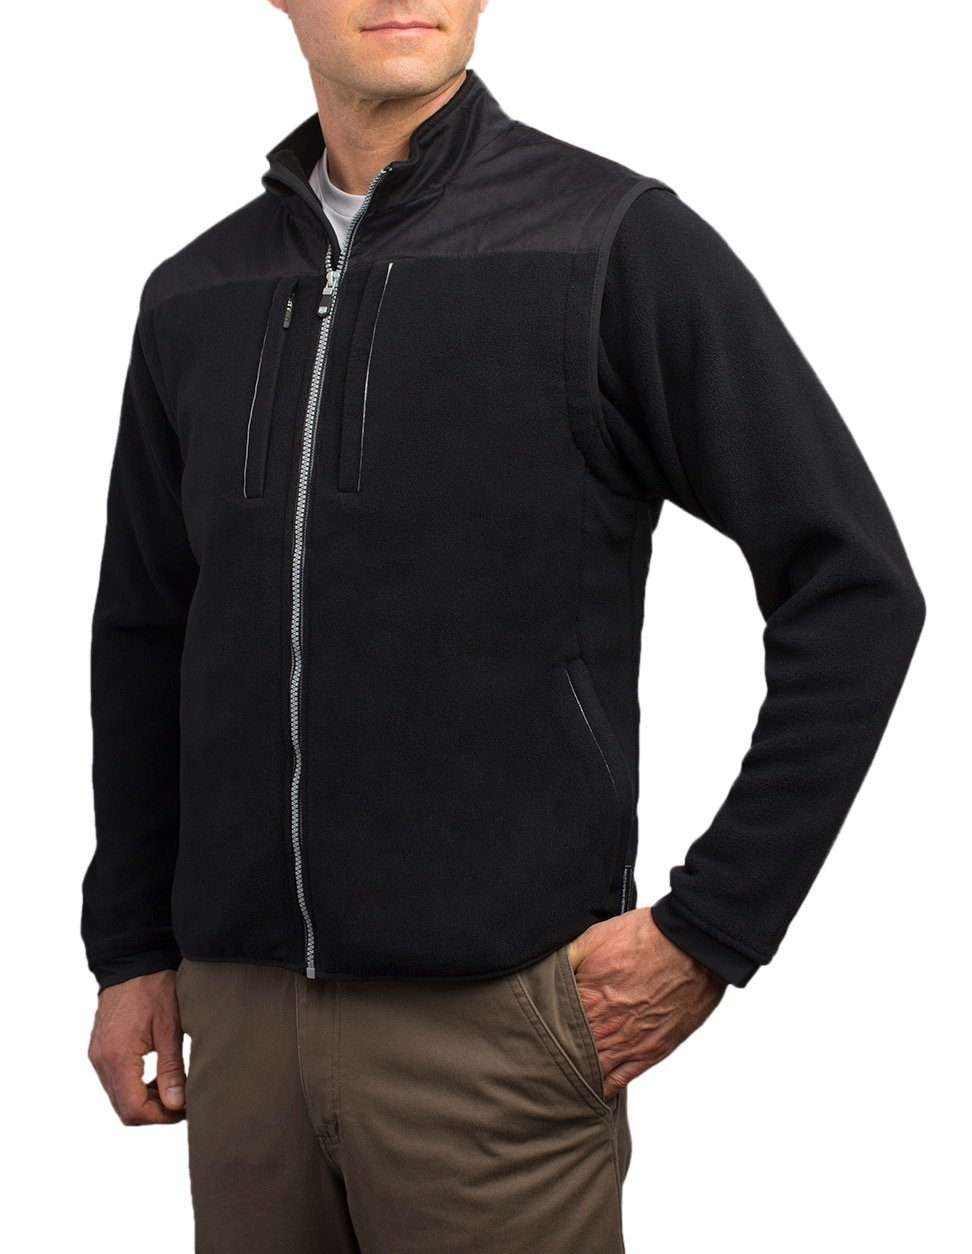 SCOTTeVEST Fleece 8.0 Jacket - 21 Pockets - RFID Blocking, Travel Clothing M